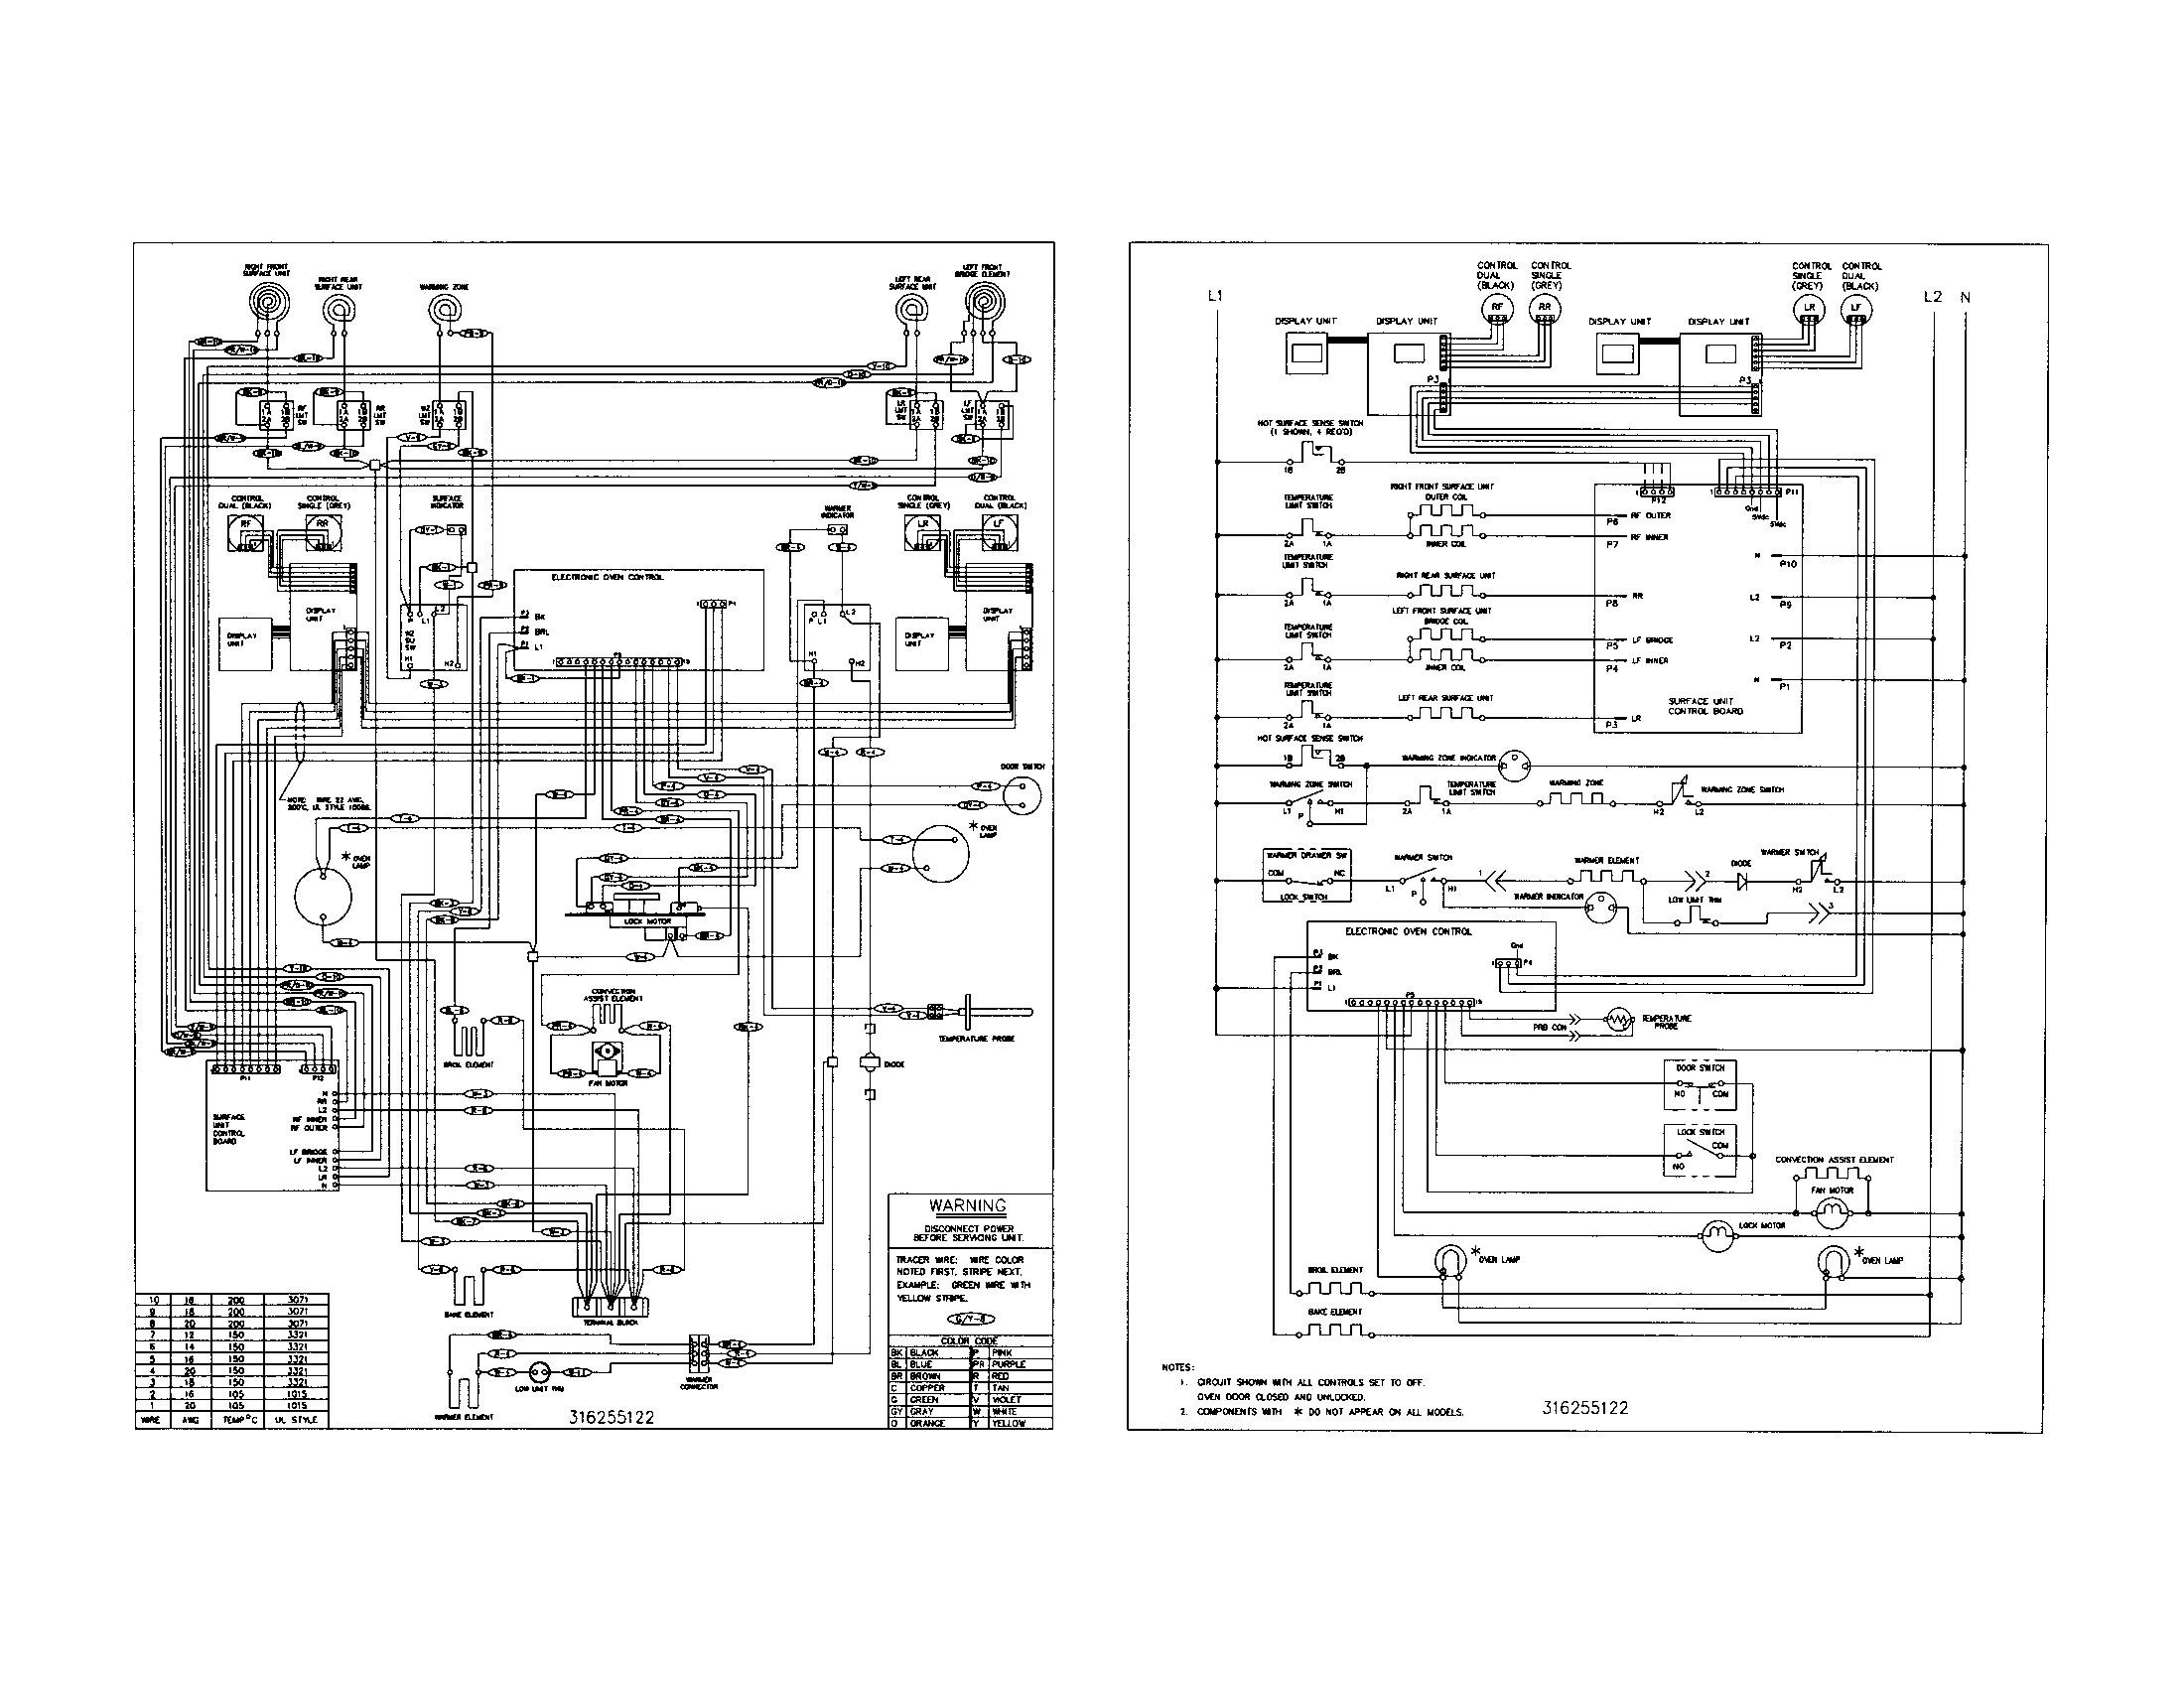 KENMORE ELITE Electric Range Parts Model Sears Outstanding Wiring Diagram